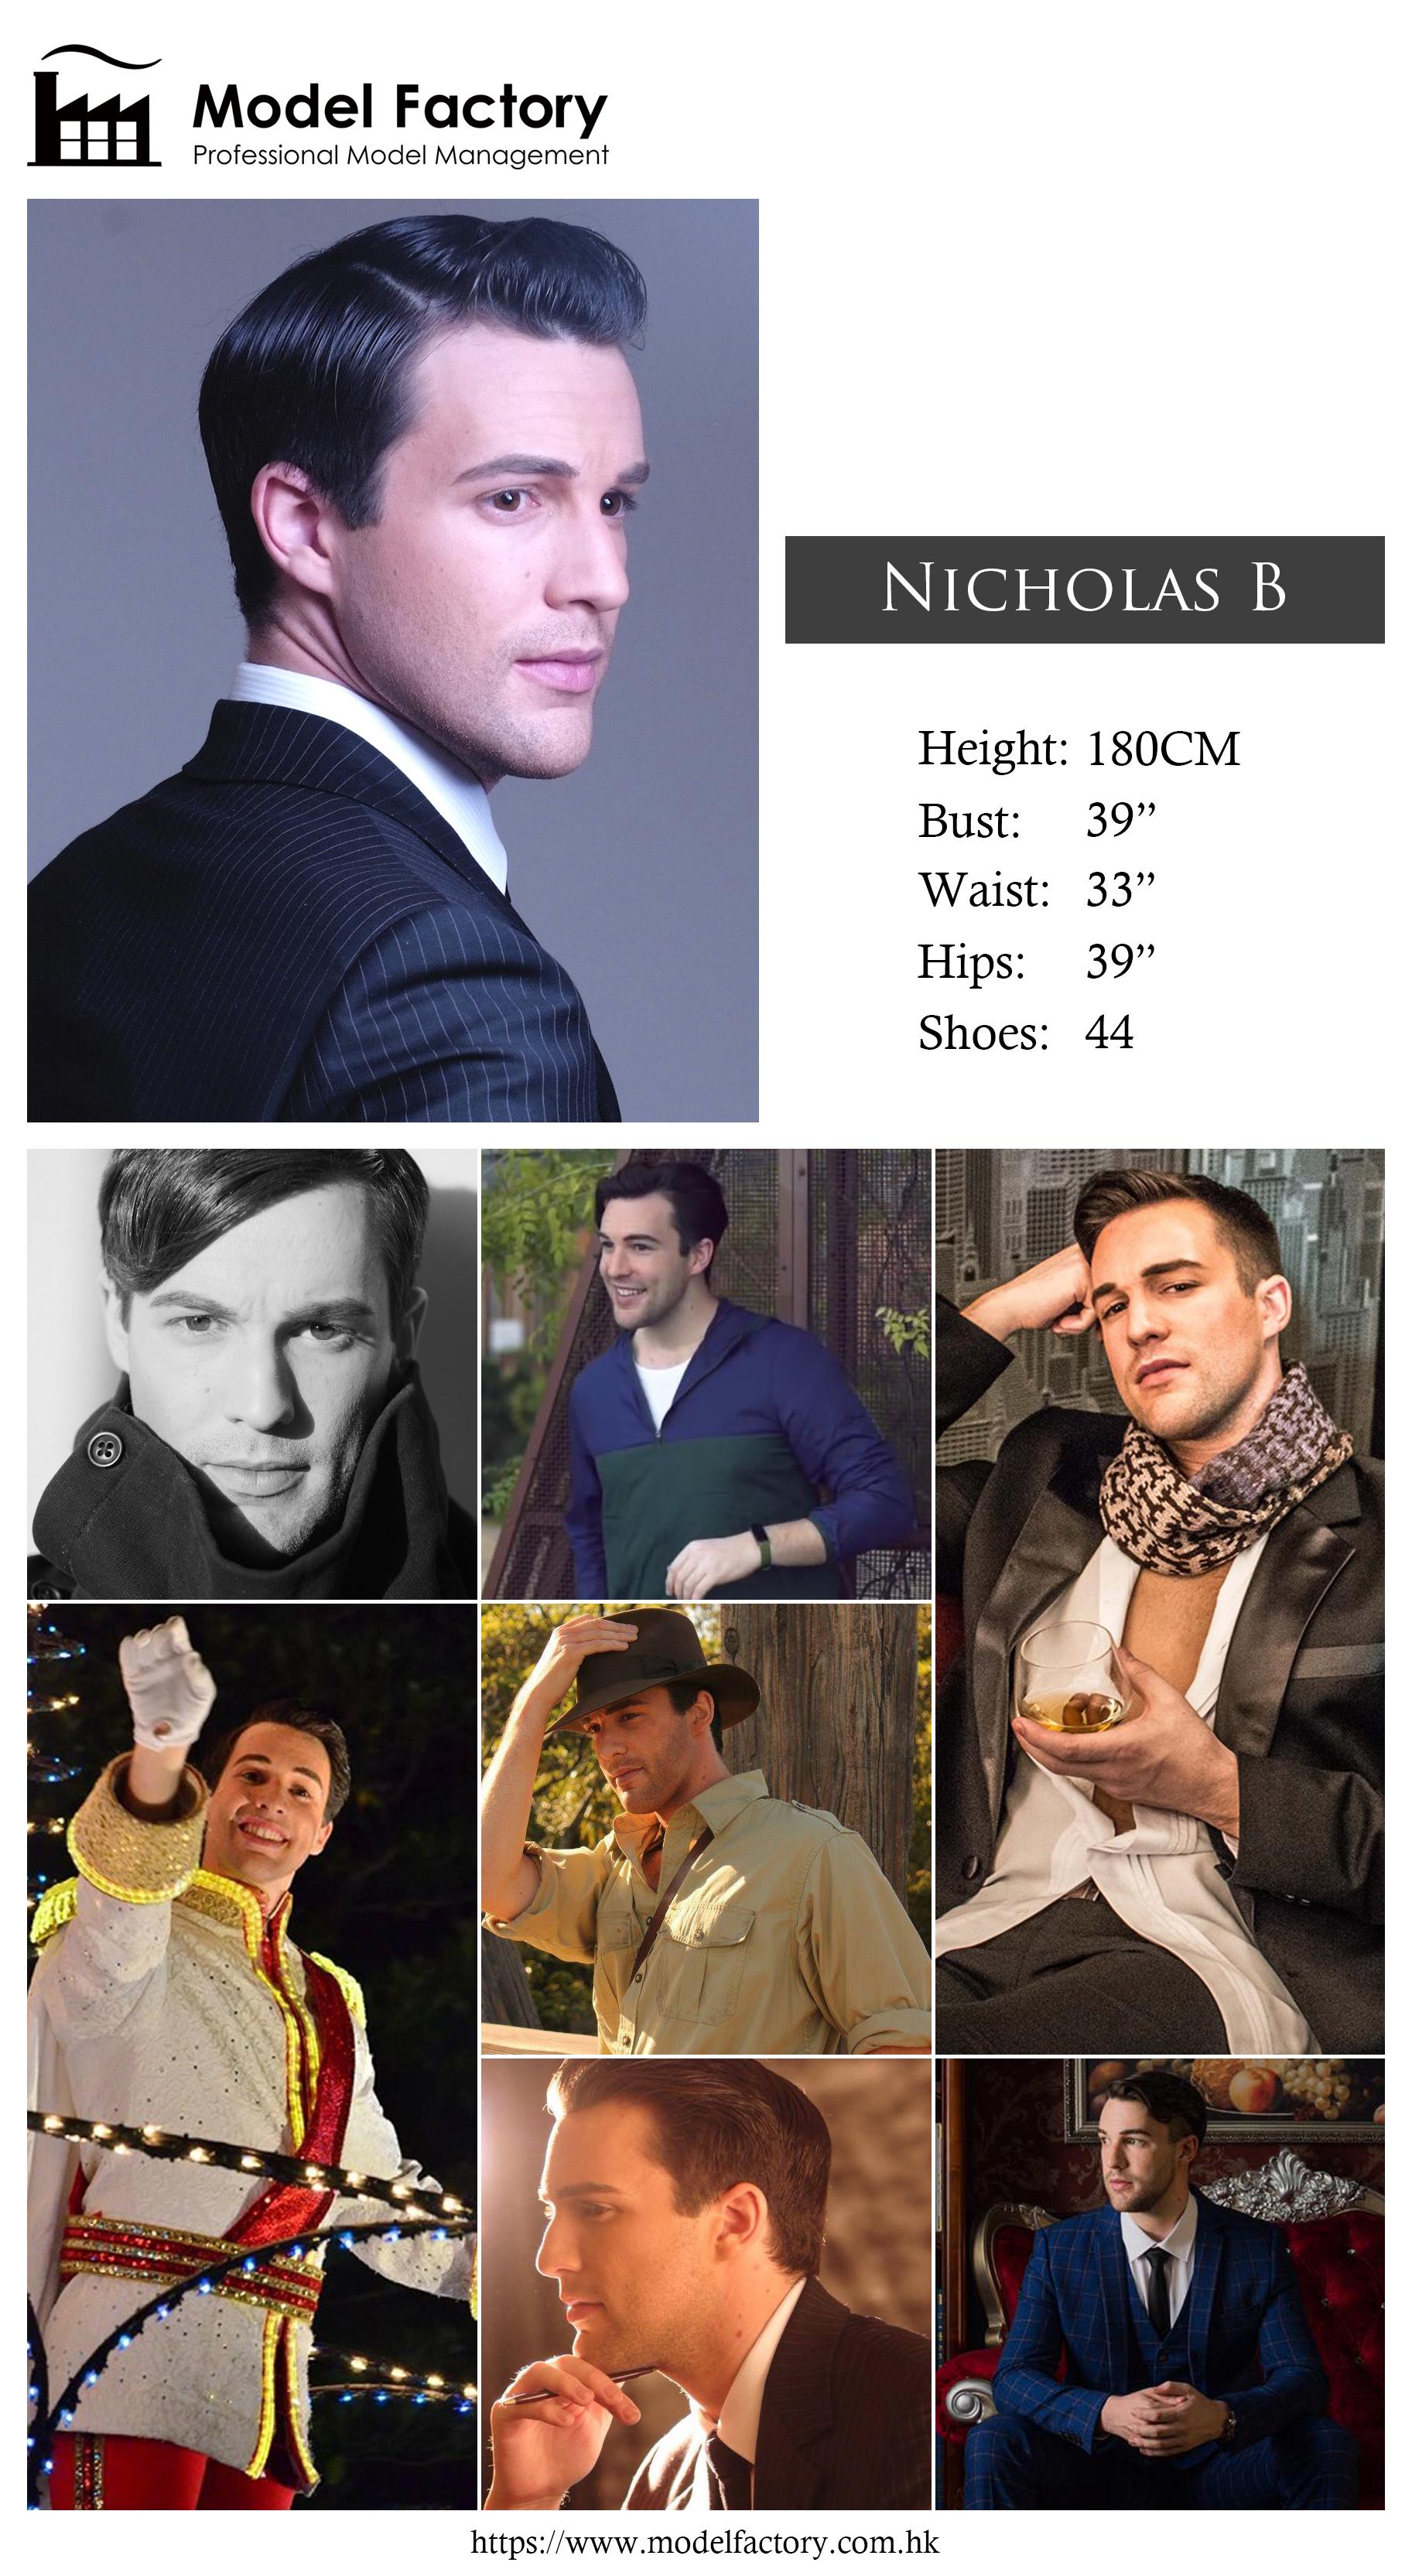 Model Factory Caucasian Male Model NicholasB